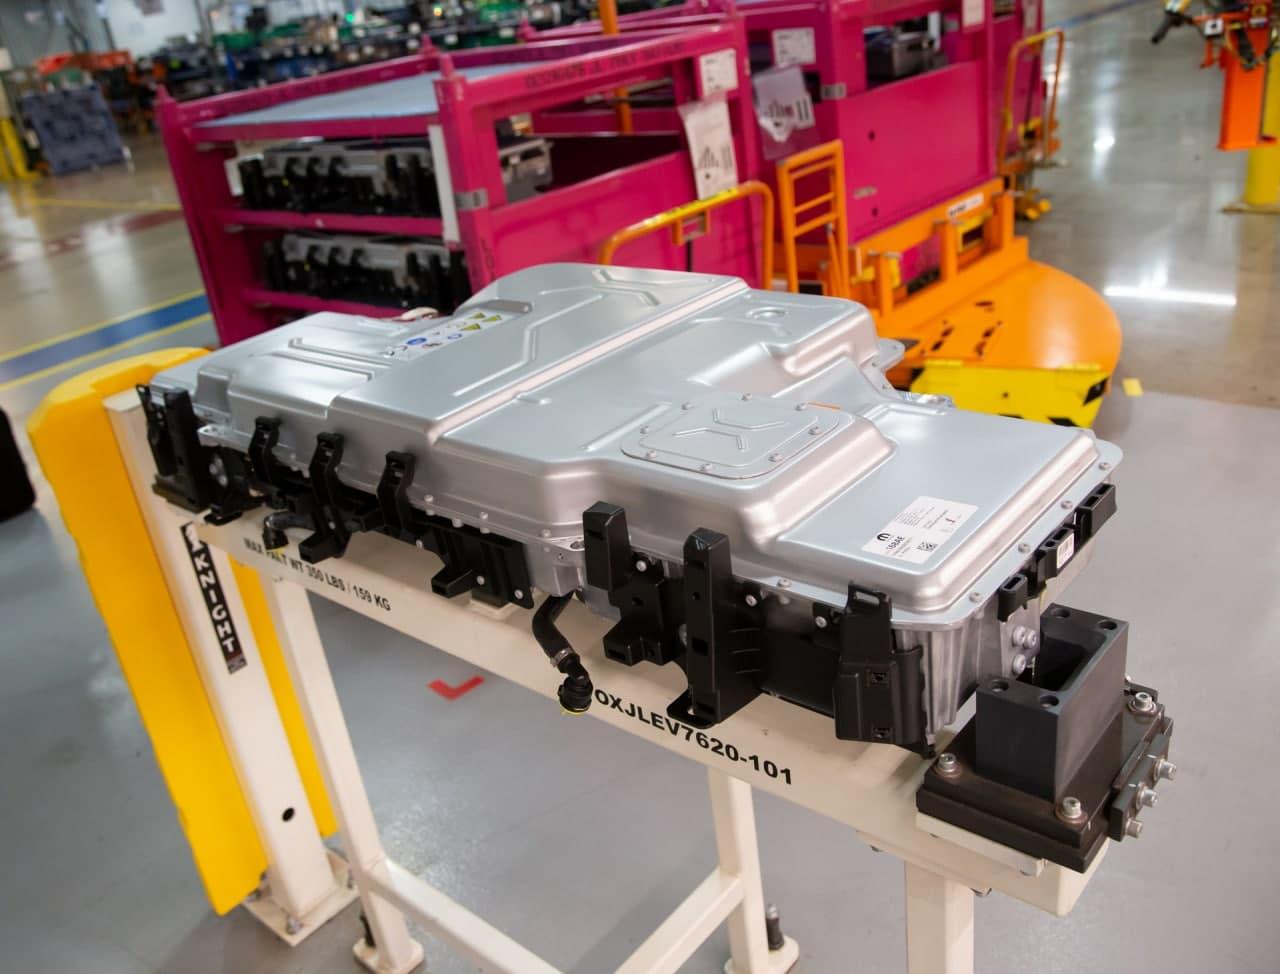 Stellantis正在洽谈在意大利建造电池厂